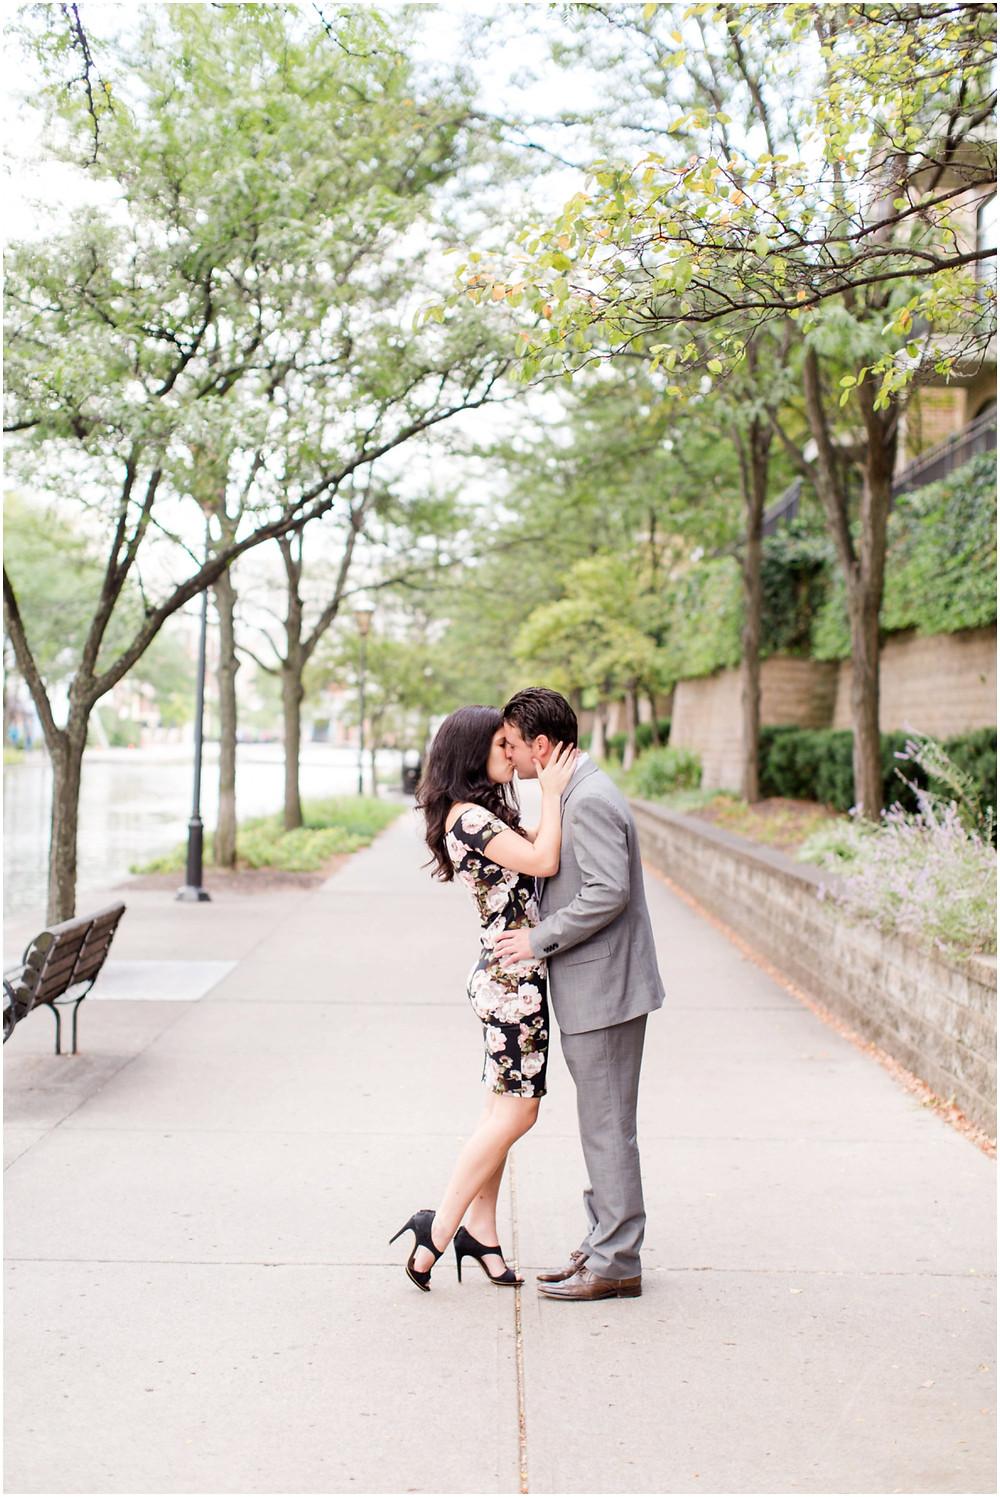 Romantic engagement  sessions